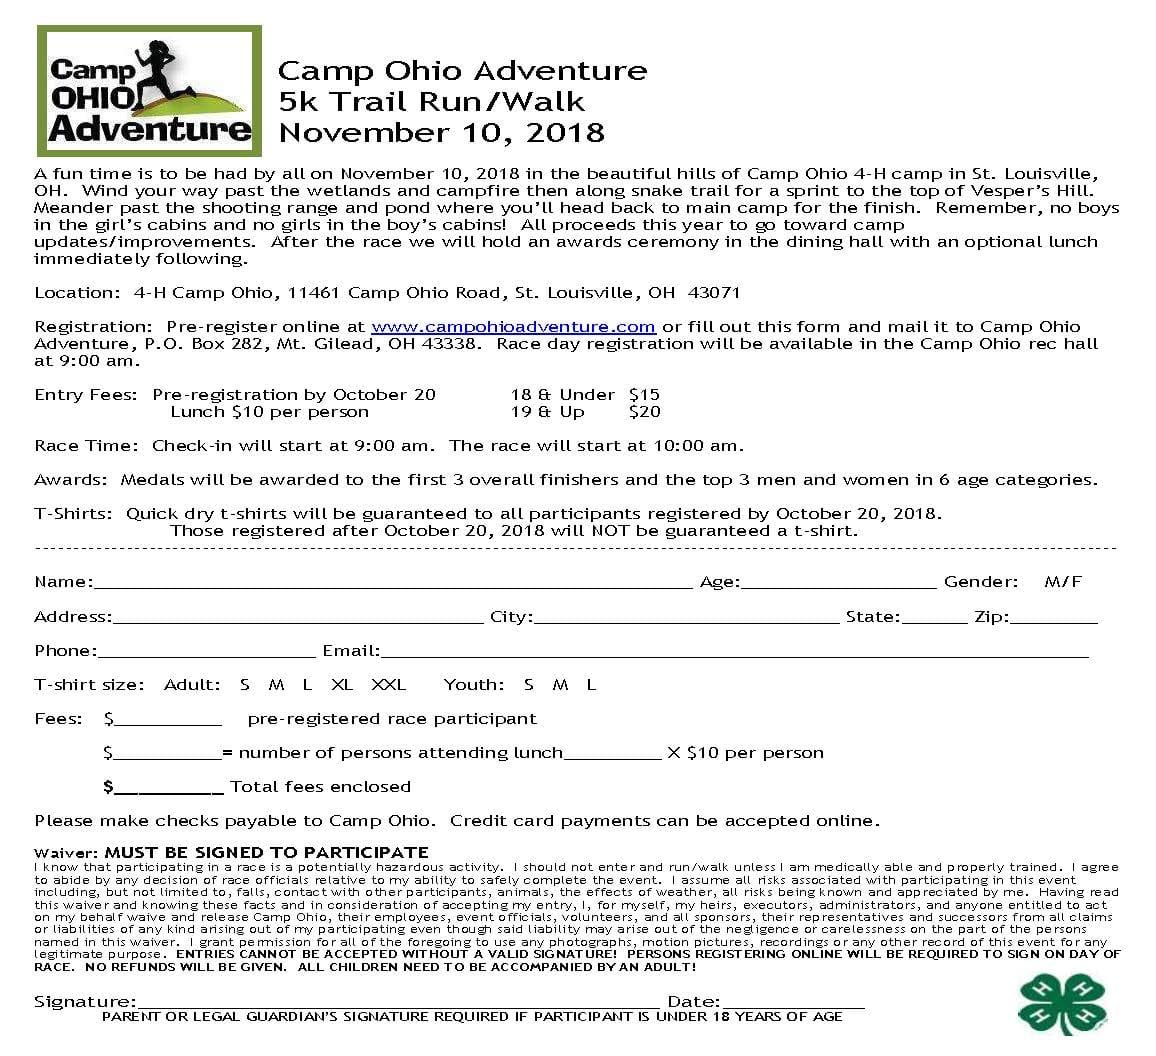 Camp Ohio Adventure 5K Trail Run/Walk | Knox County 4-H